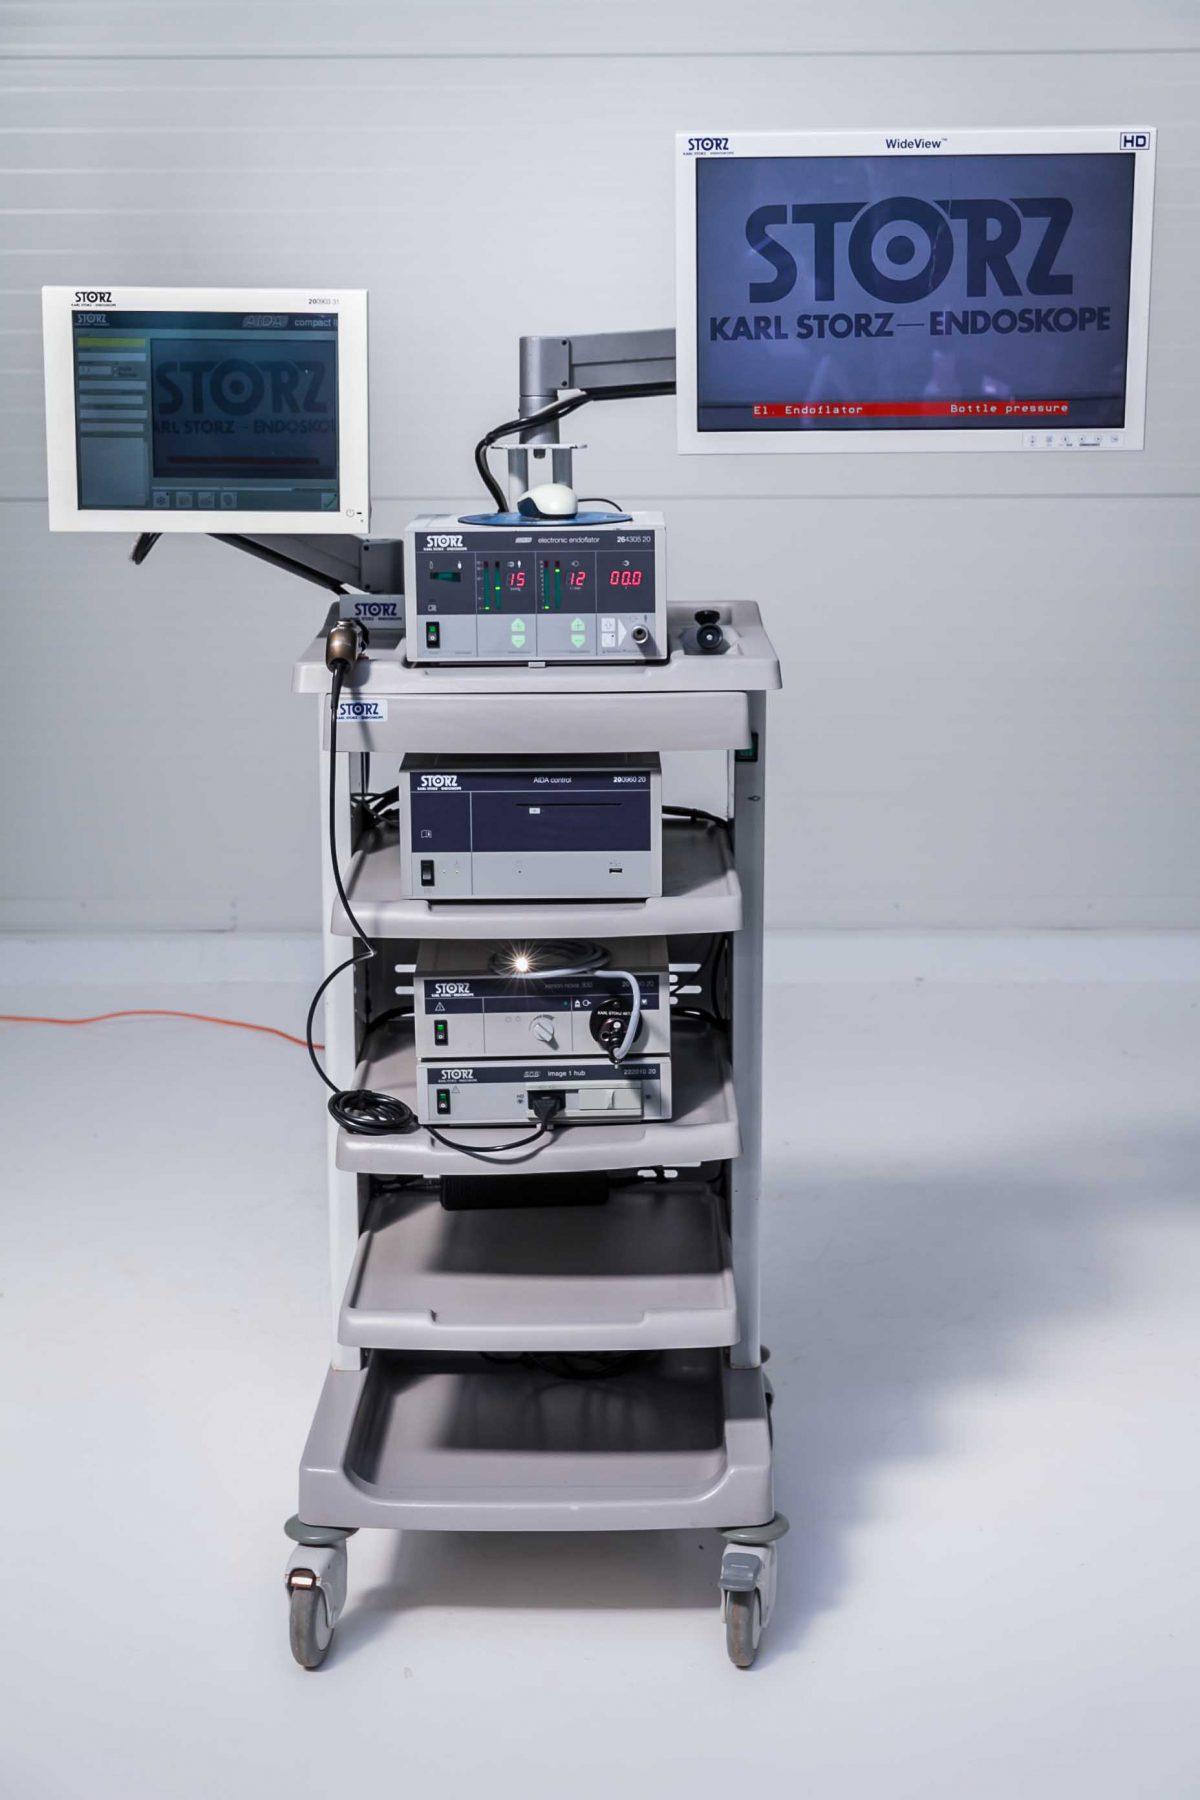 Karl Storz Image 1 Hub H-3 Zestaw Endoskopowy HD